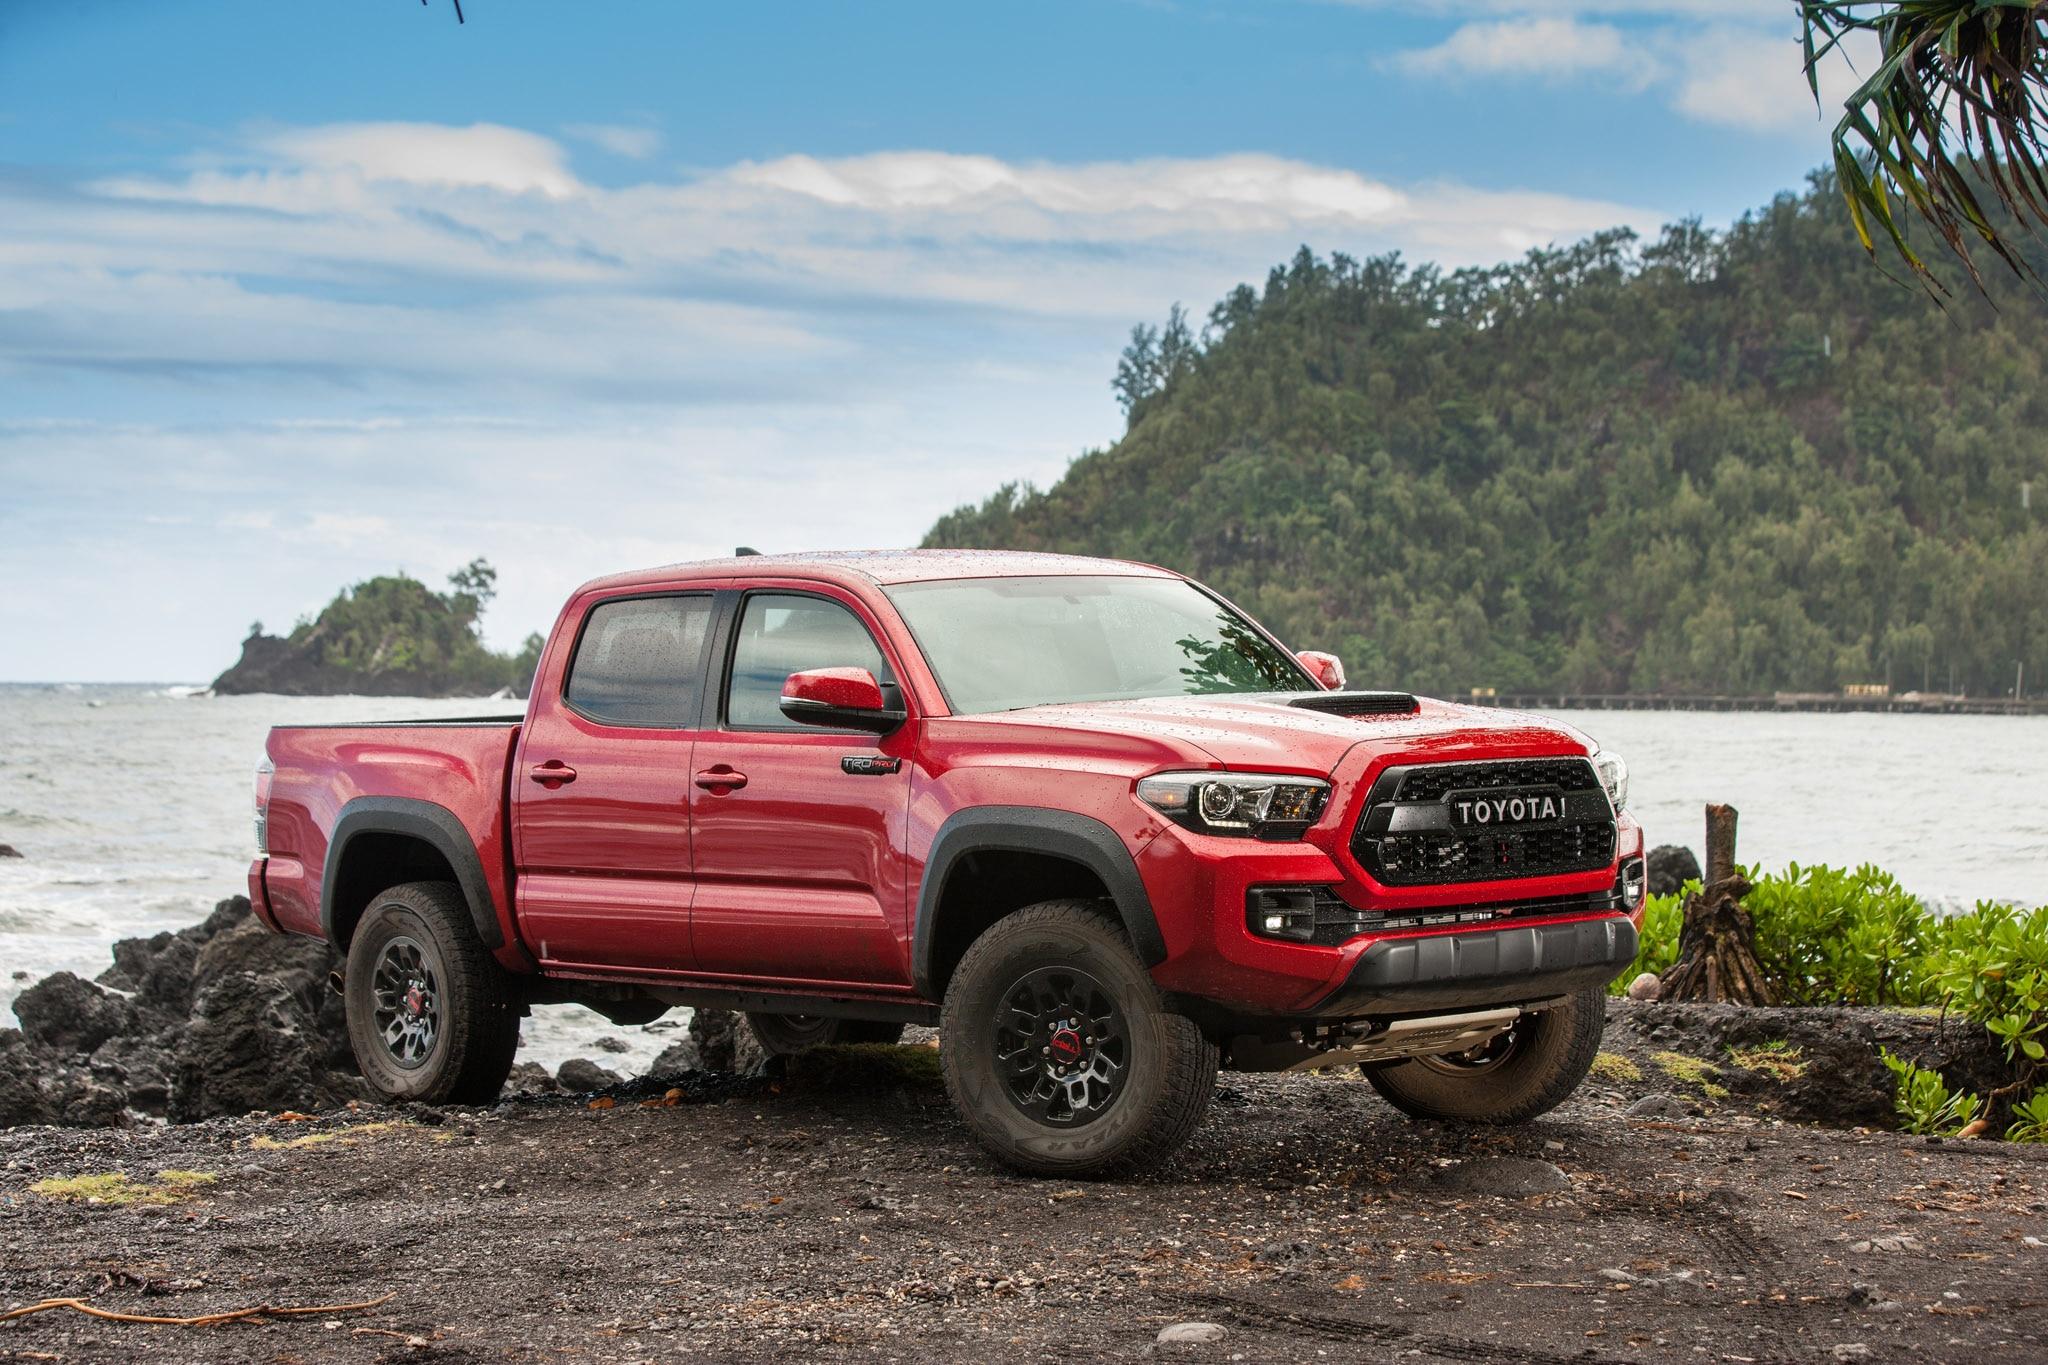 2017 Toyota Tacoma TRD Pro Passenger Side